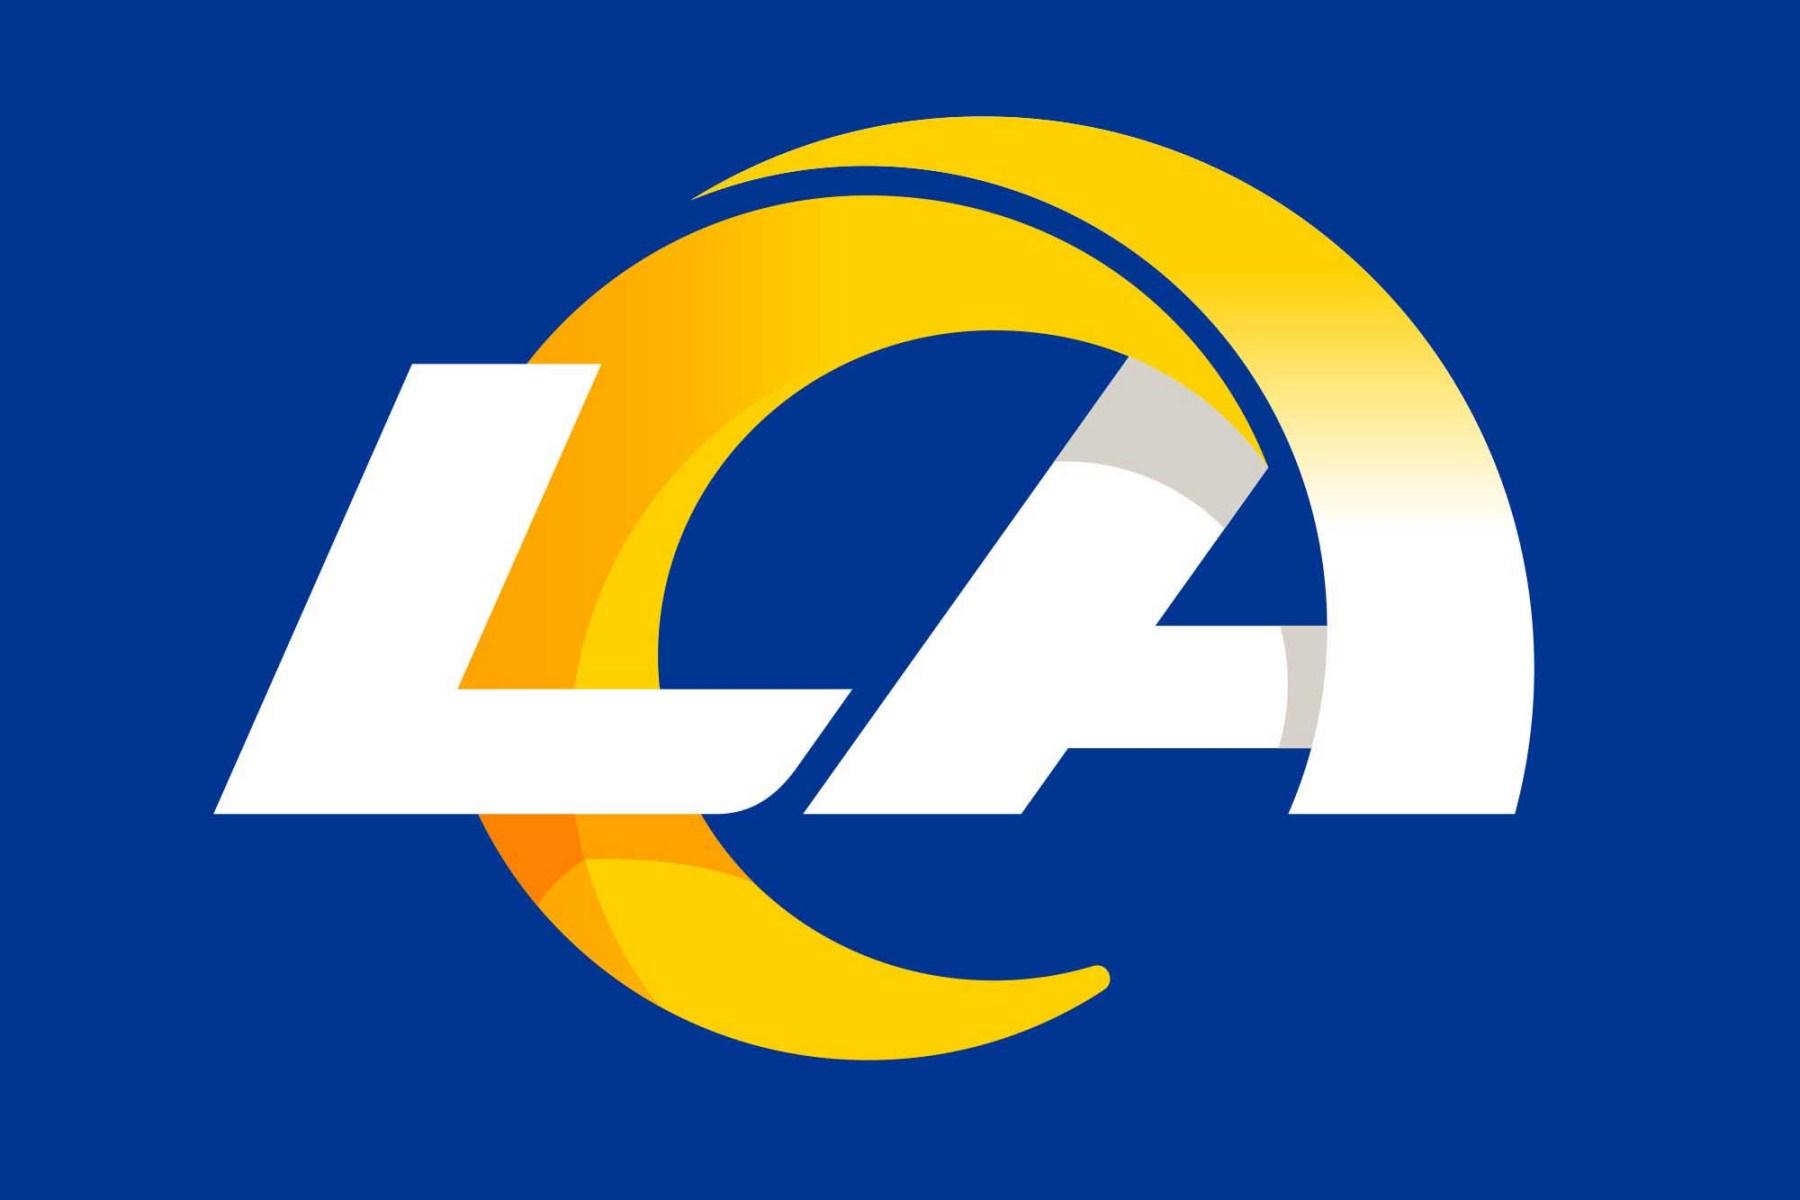 nuevo logo de la rams